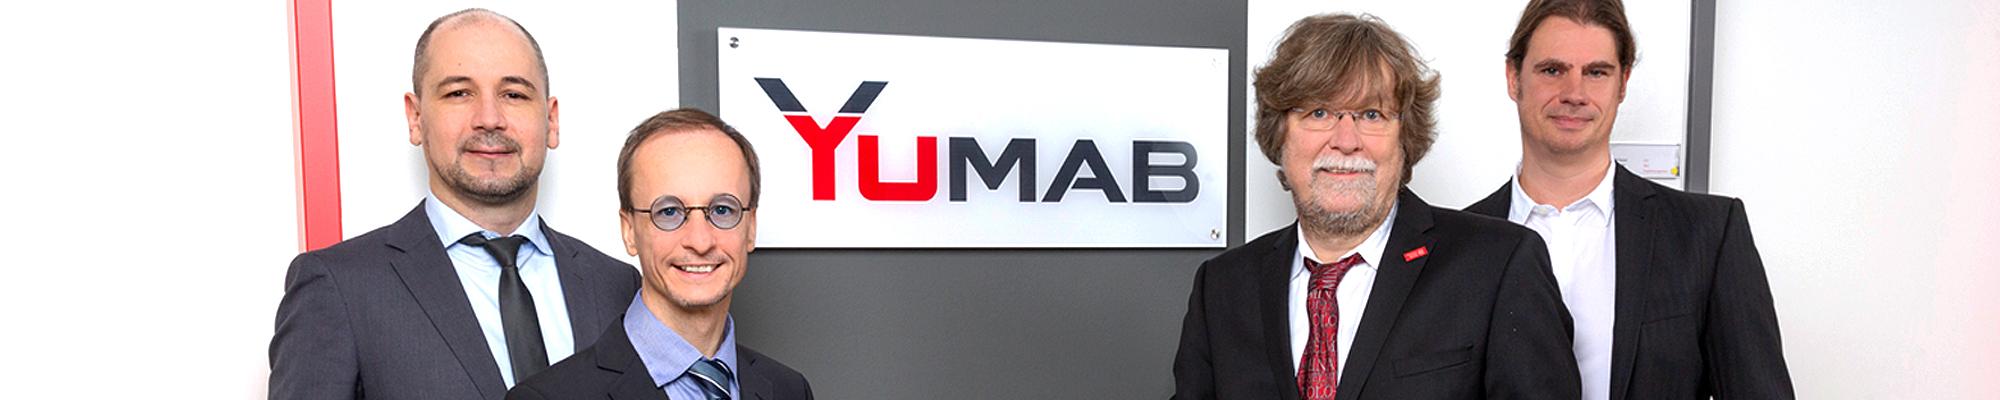 Slider-image-Subpage-Yumab-Founders